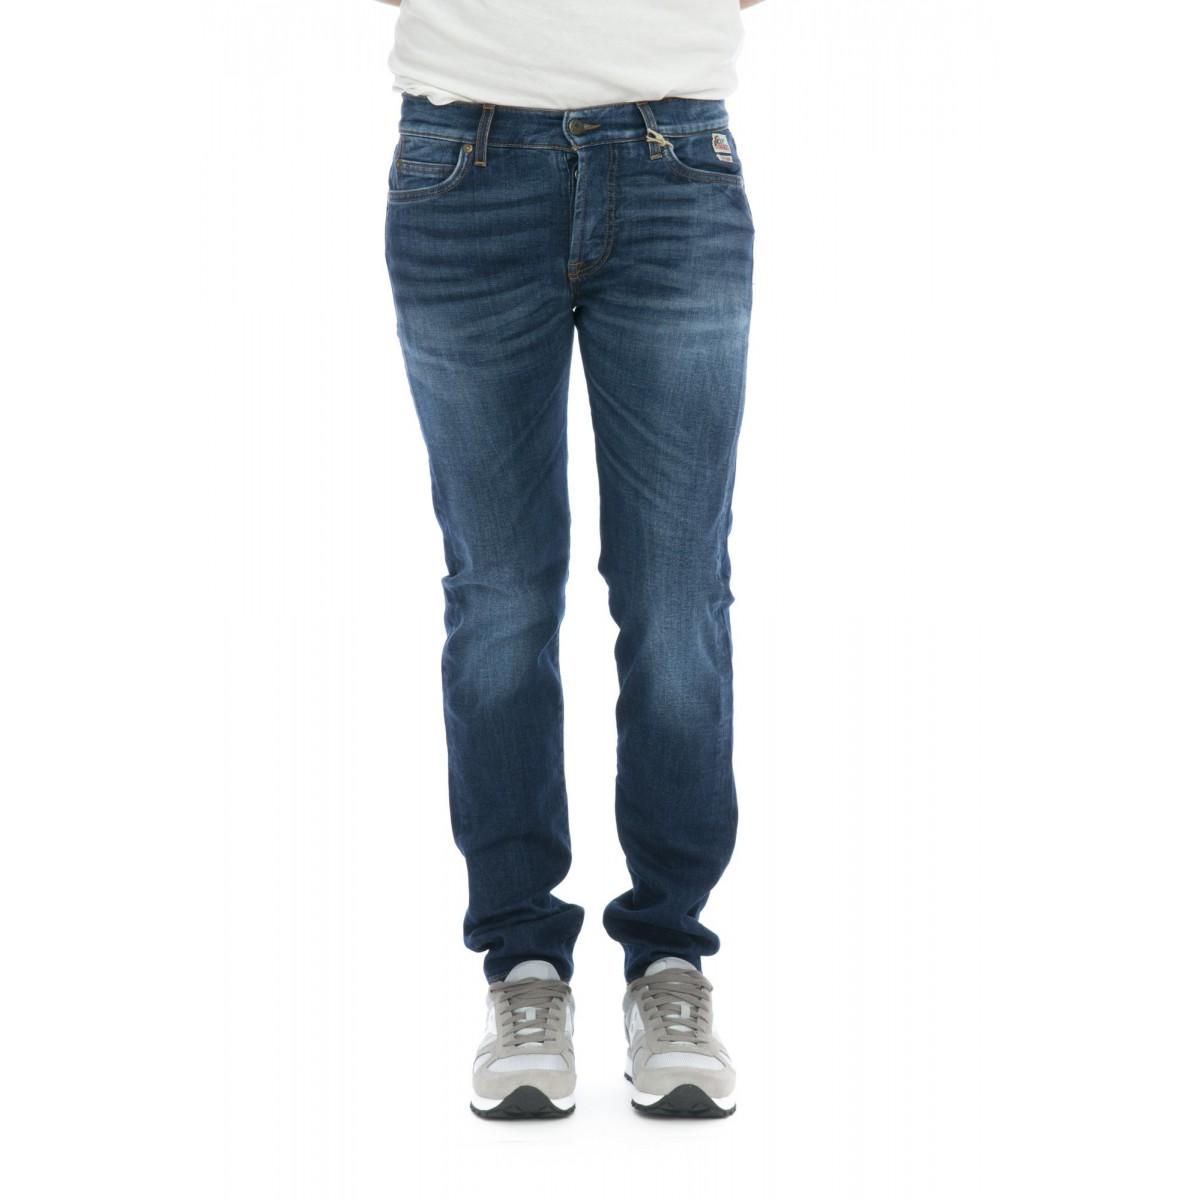 Jeans - Pf18 apua superior jeans